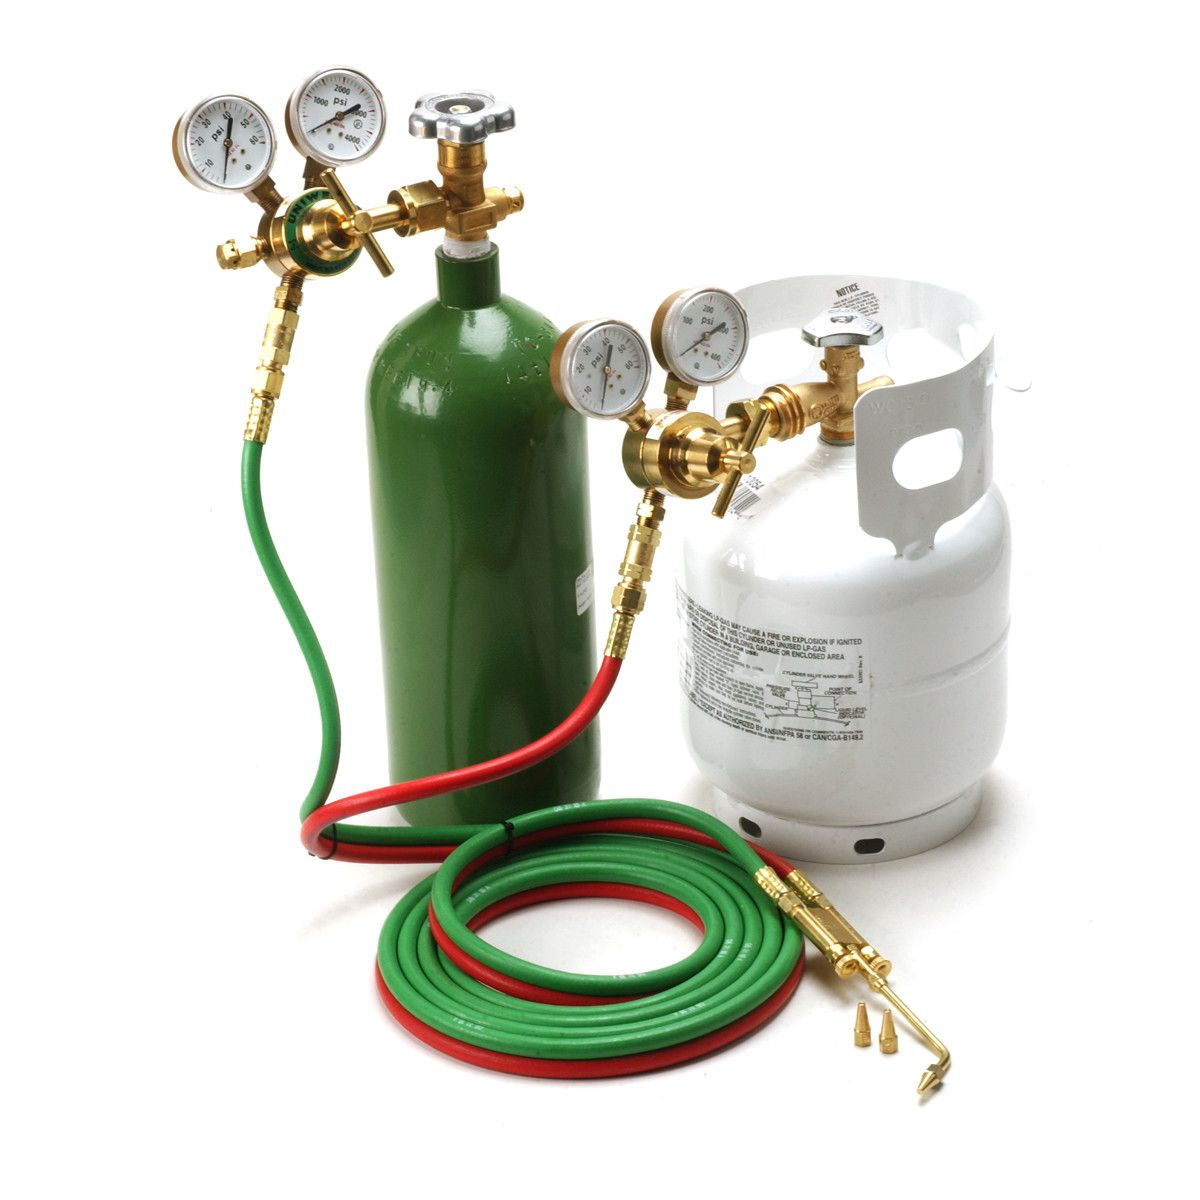 Meco Midget Torch Kit Complete For Oxygen Propane With Hoses Gauges Empty Tanks Ottofrei Com Taller De Joyeria Joyeria Taller